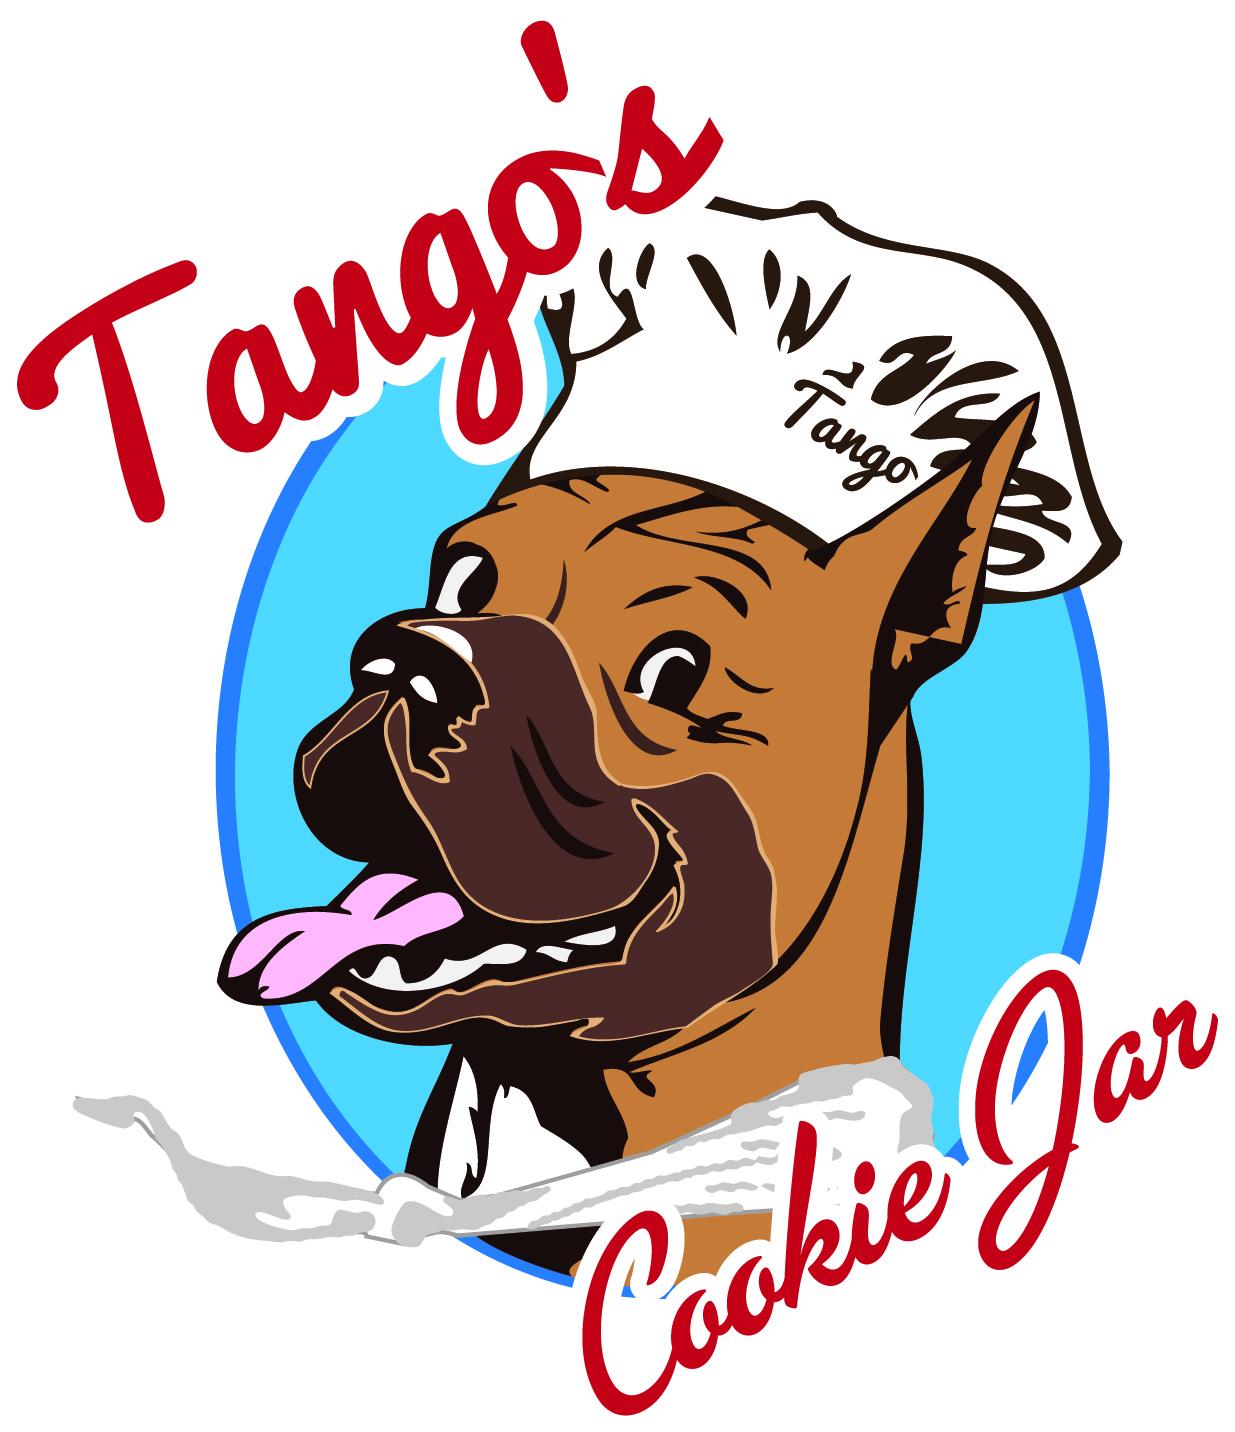 Tango's Cookie Jar